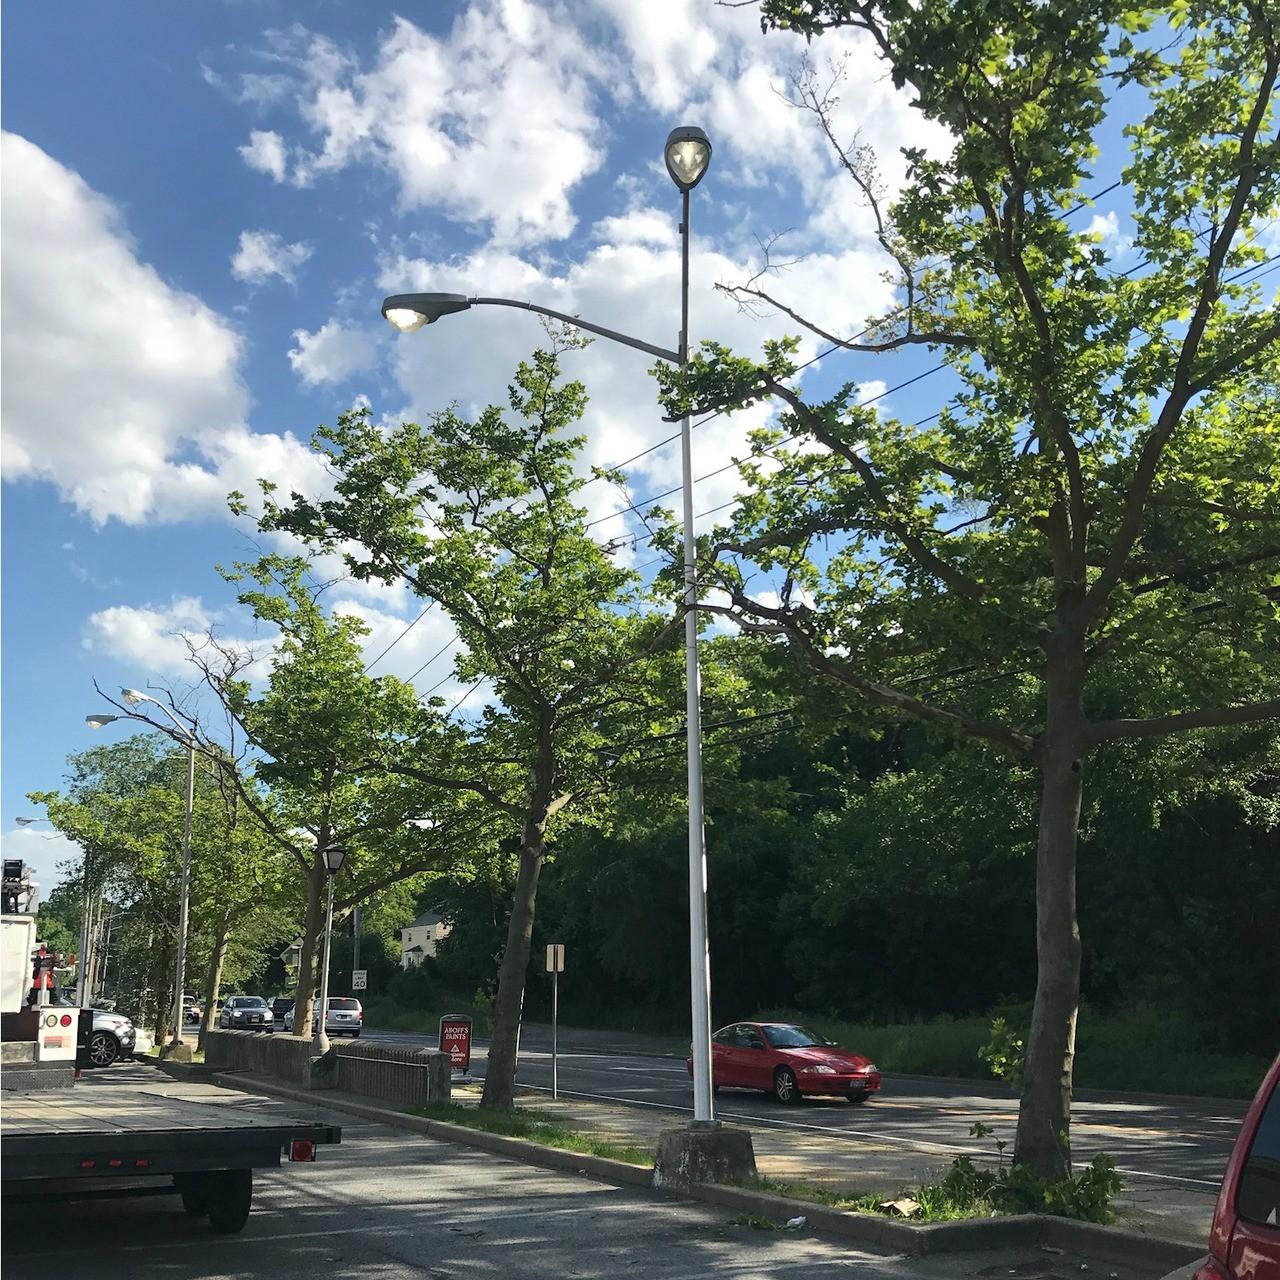 Light Poles Plus: #1585: Huntington Station, New York